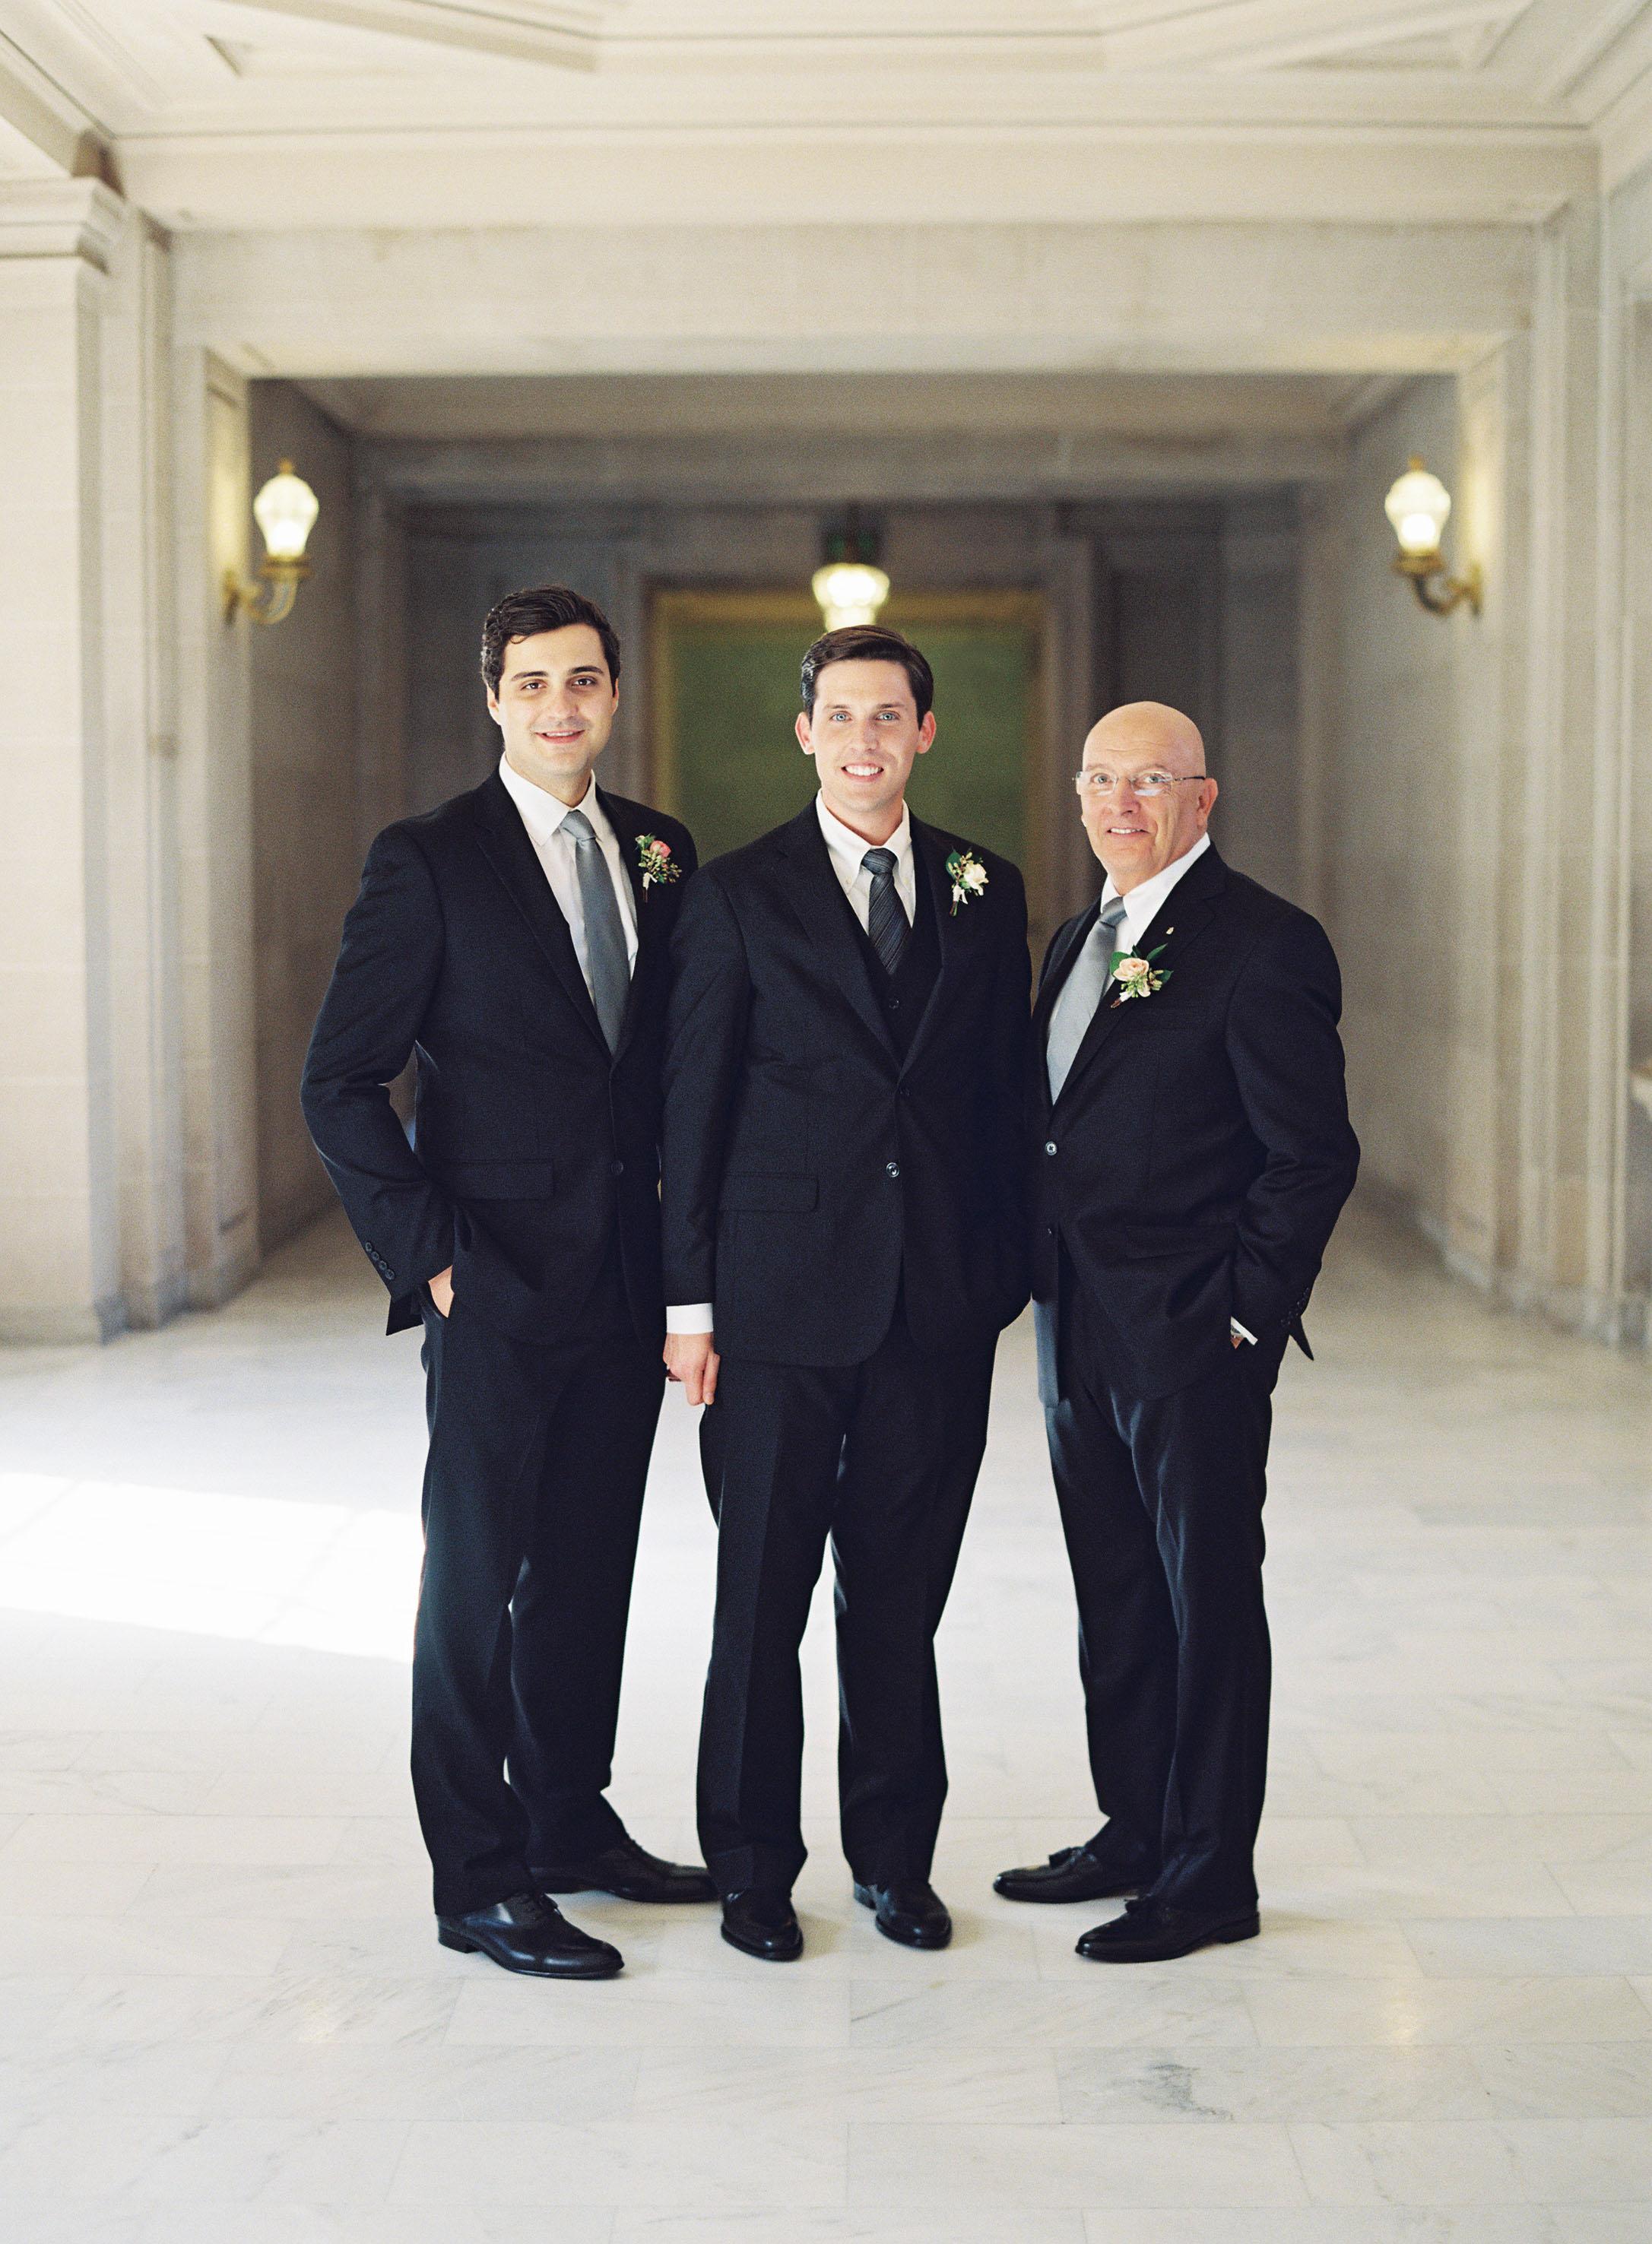 Meghan Mehan Photography - California Wedding Photographer | San Francisco City Hall Wedding 071.jpg